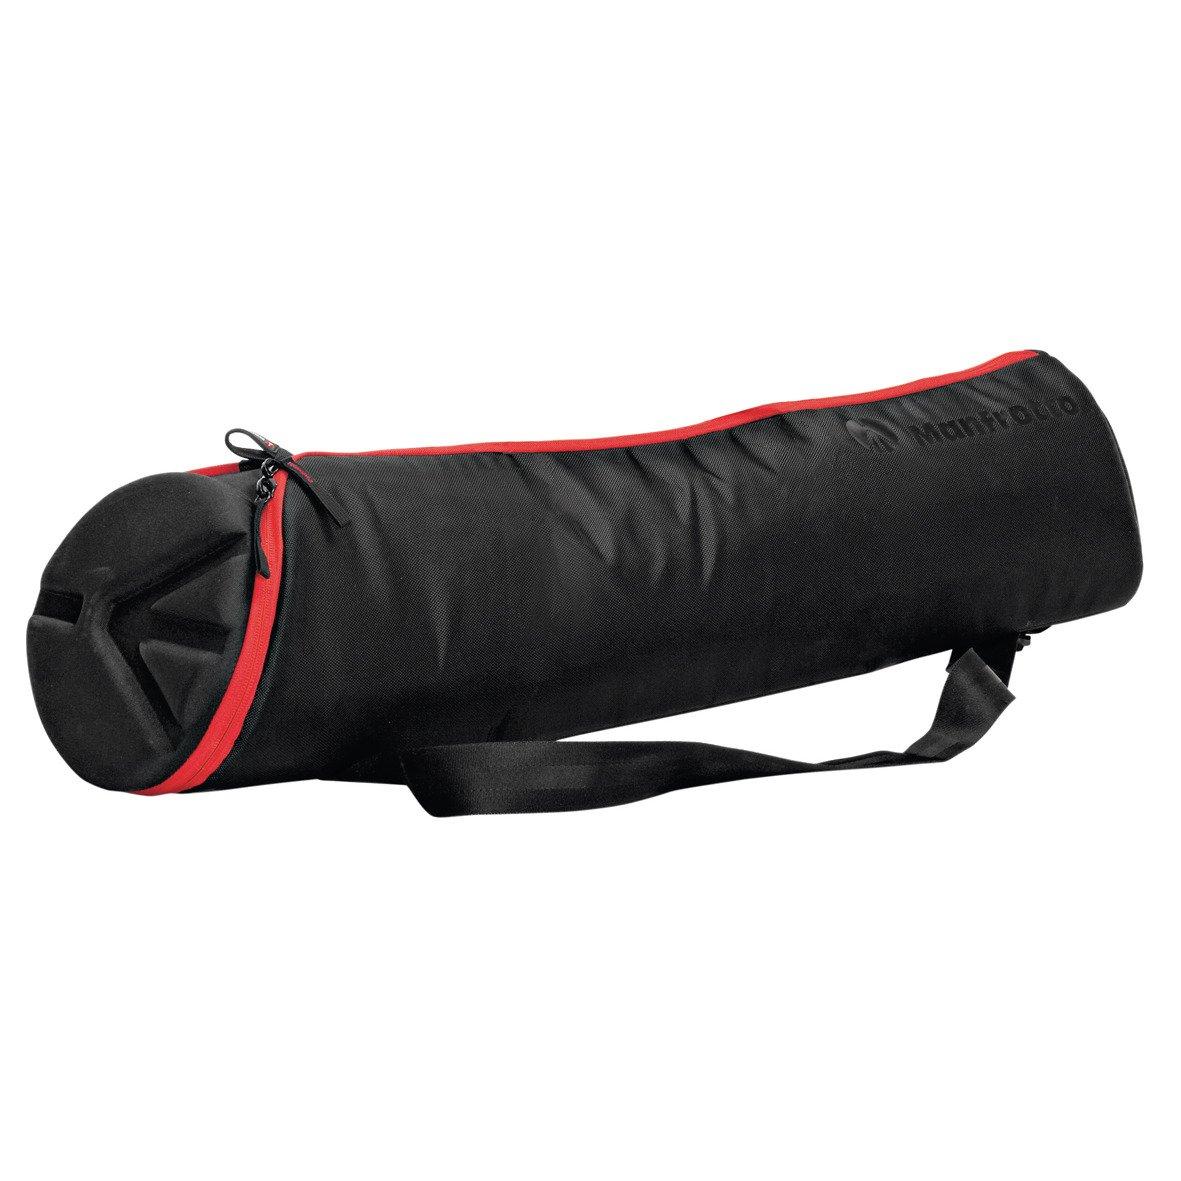 Manfrotto MB MBAG80PN Padded 80cm Tripod Bag